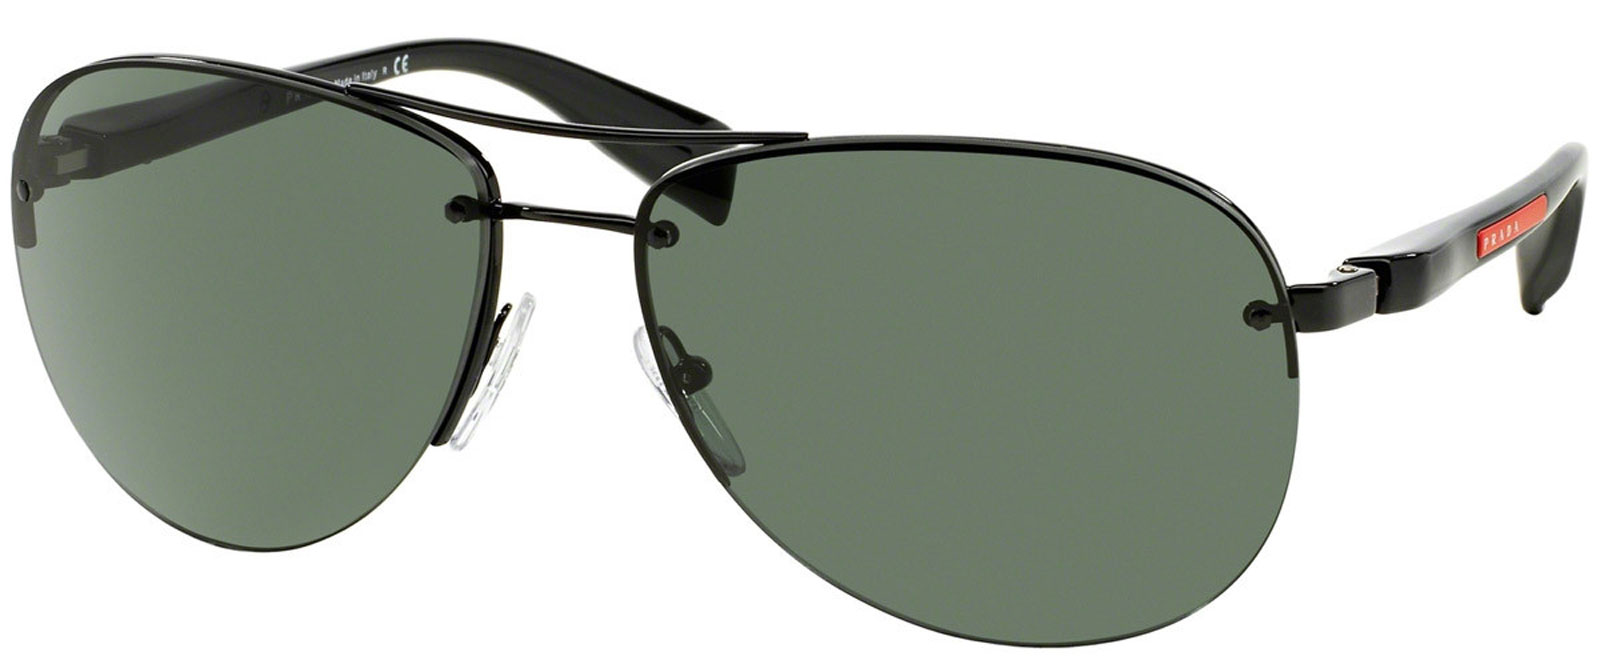 New PRADA PS56MS 7AX3O1 Black Metal Frame Grey Green Lens Sunglasses ...